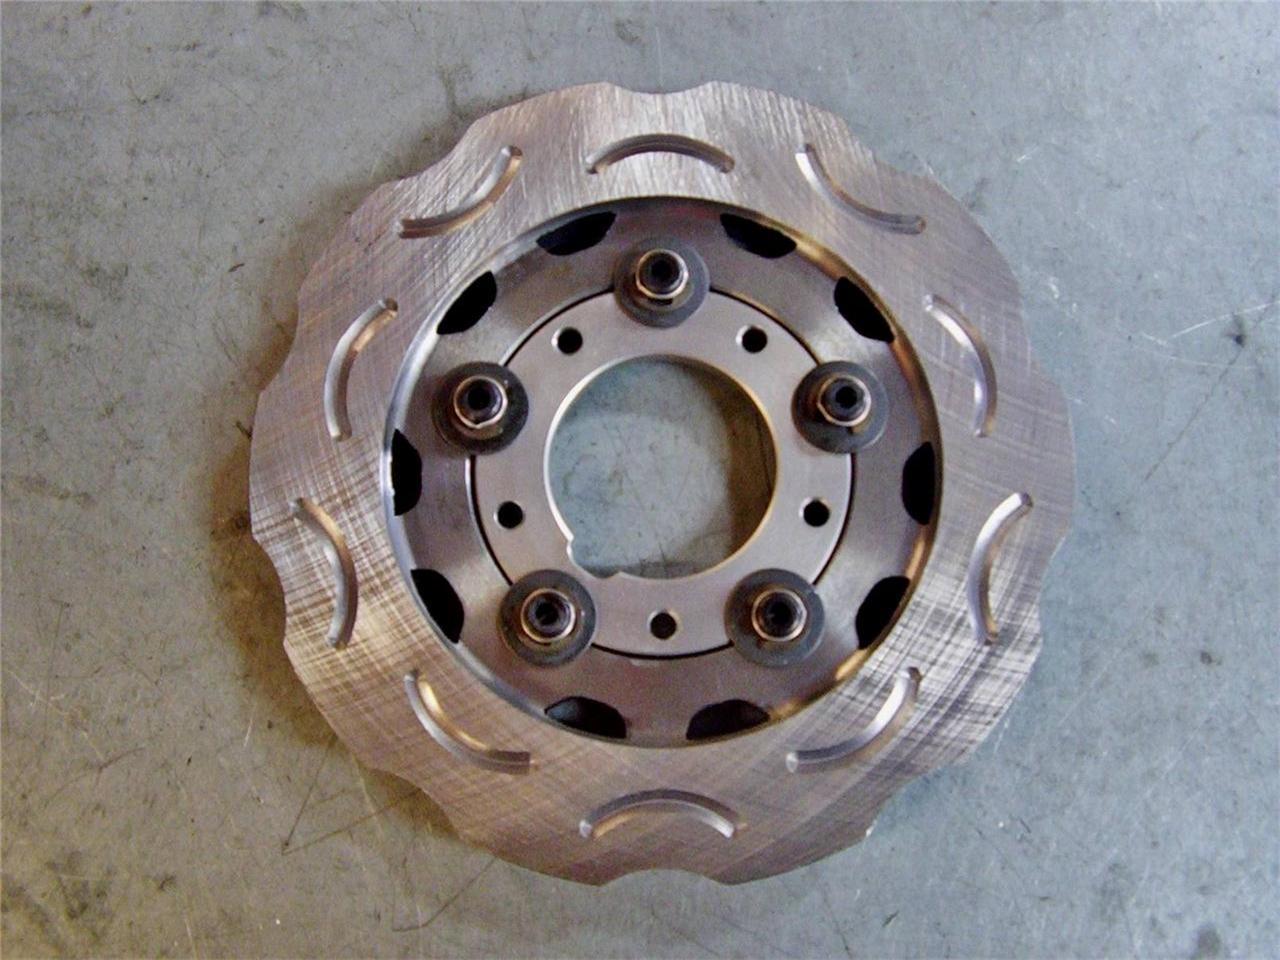 Go kart crg genuine ven cast iron brake disc complete